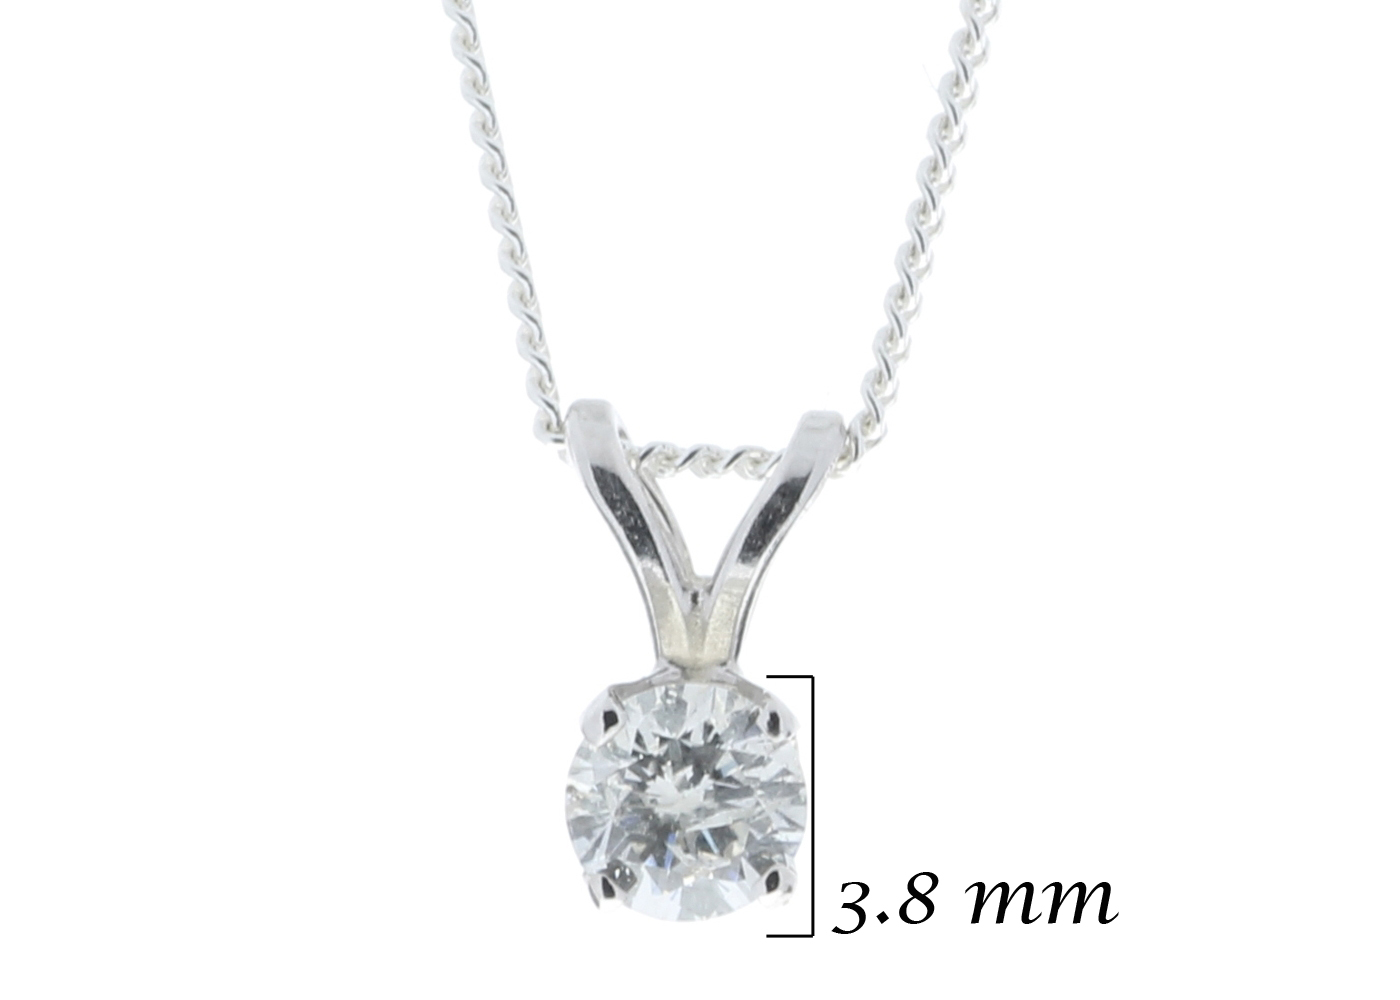 9ct White Gold Single Stone Claw Set Diamond Pendant 0.20 Carats - Image 5 of 5